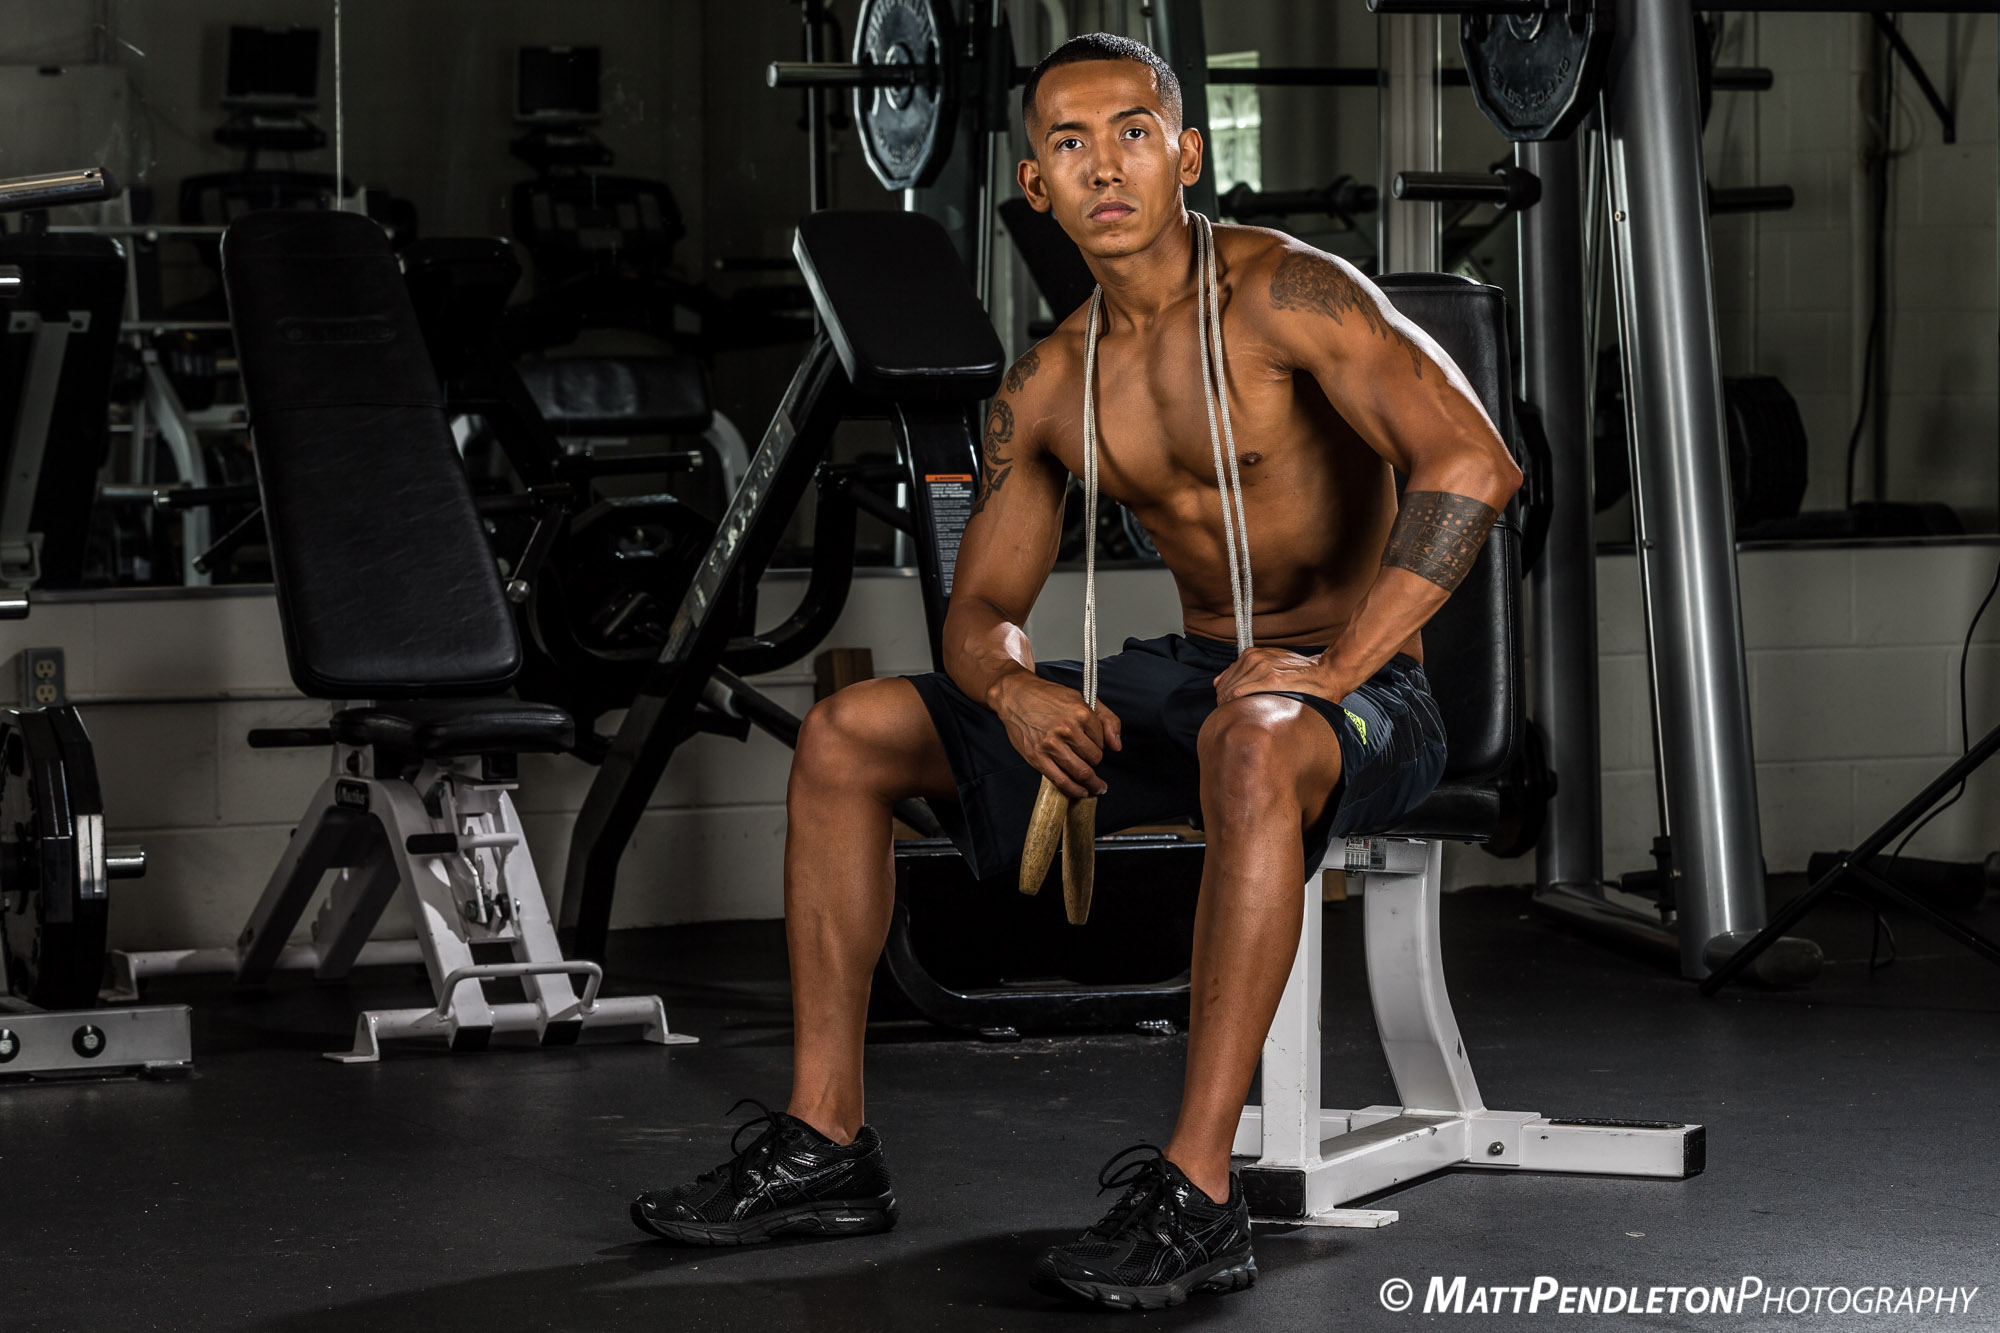 150531_EdwardTaboada_Fitness_Gym_101950_MattPendleton.jpg